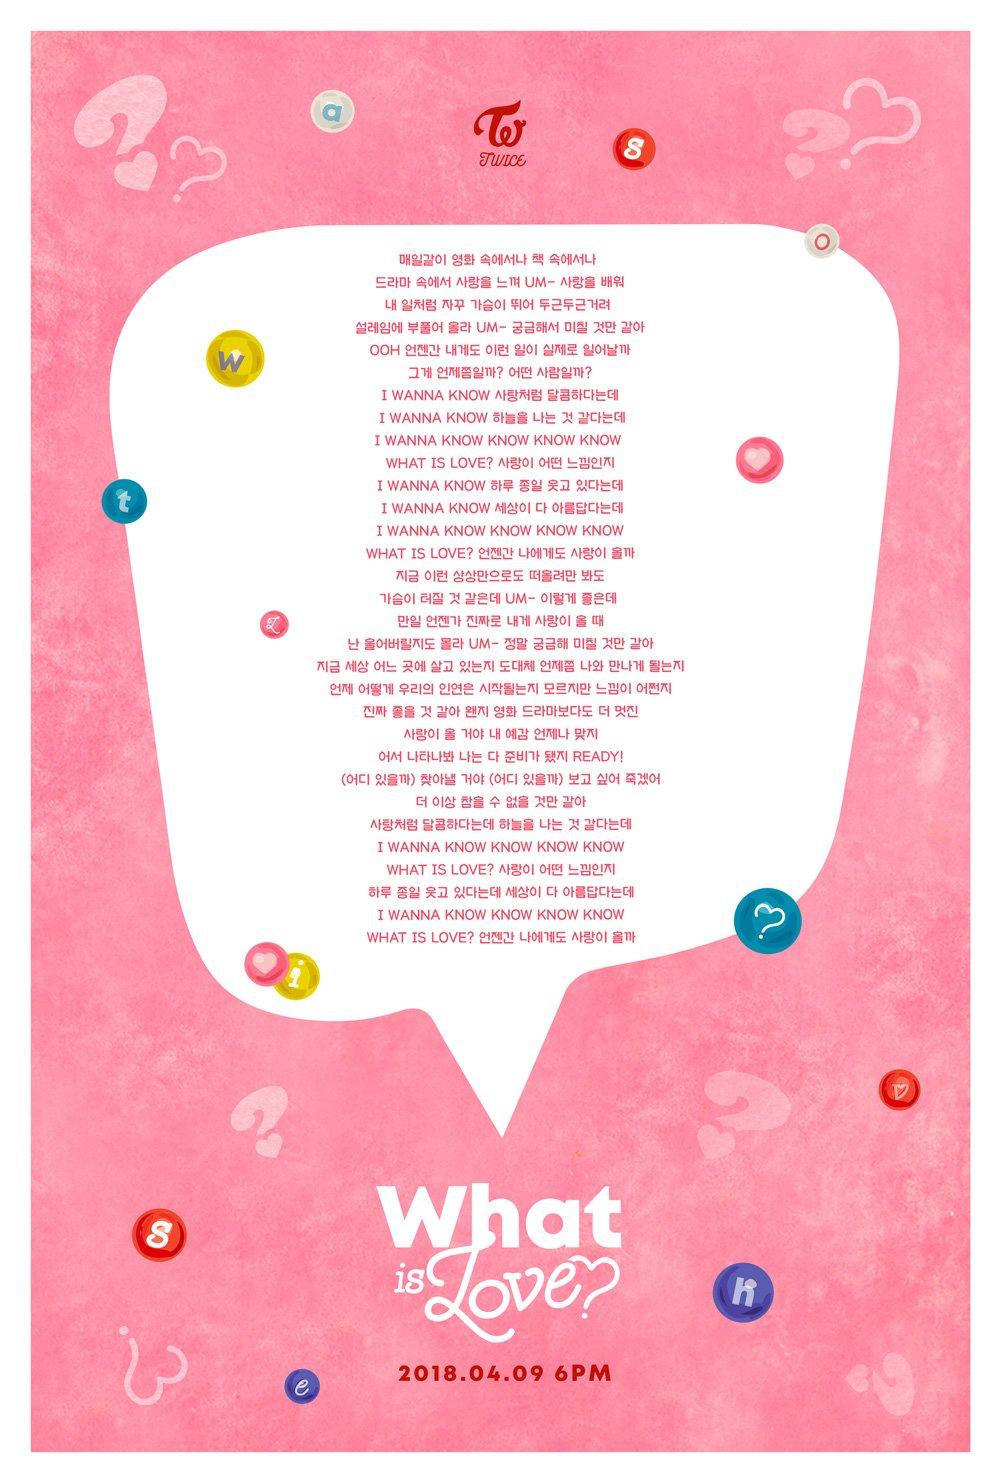 TWICE 'What is Love?' Lyrics   allkpop Forums